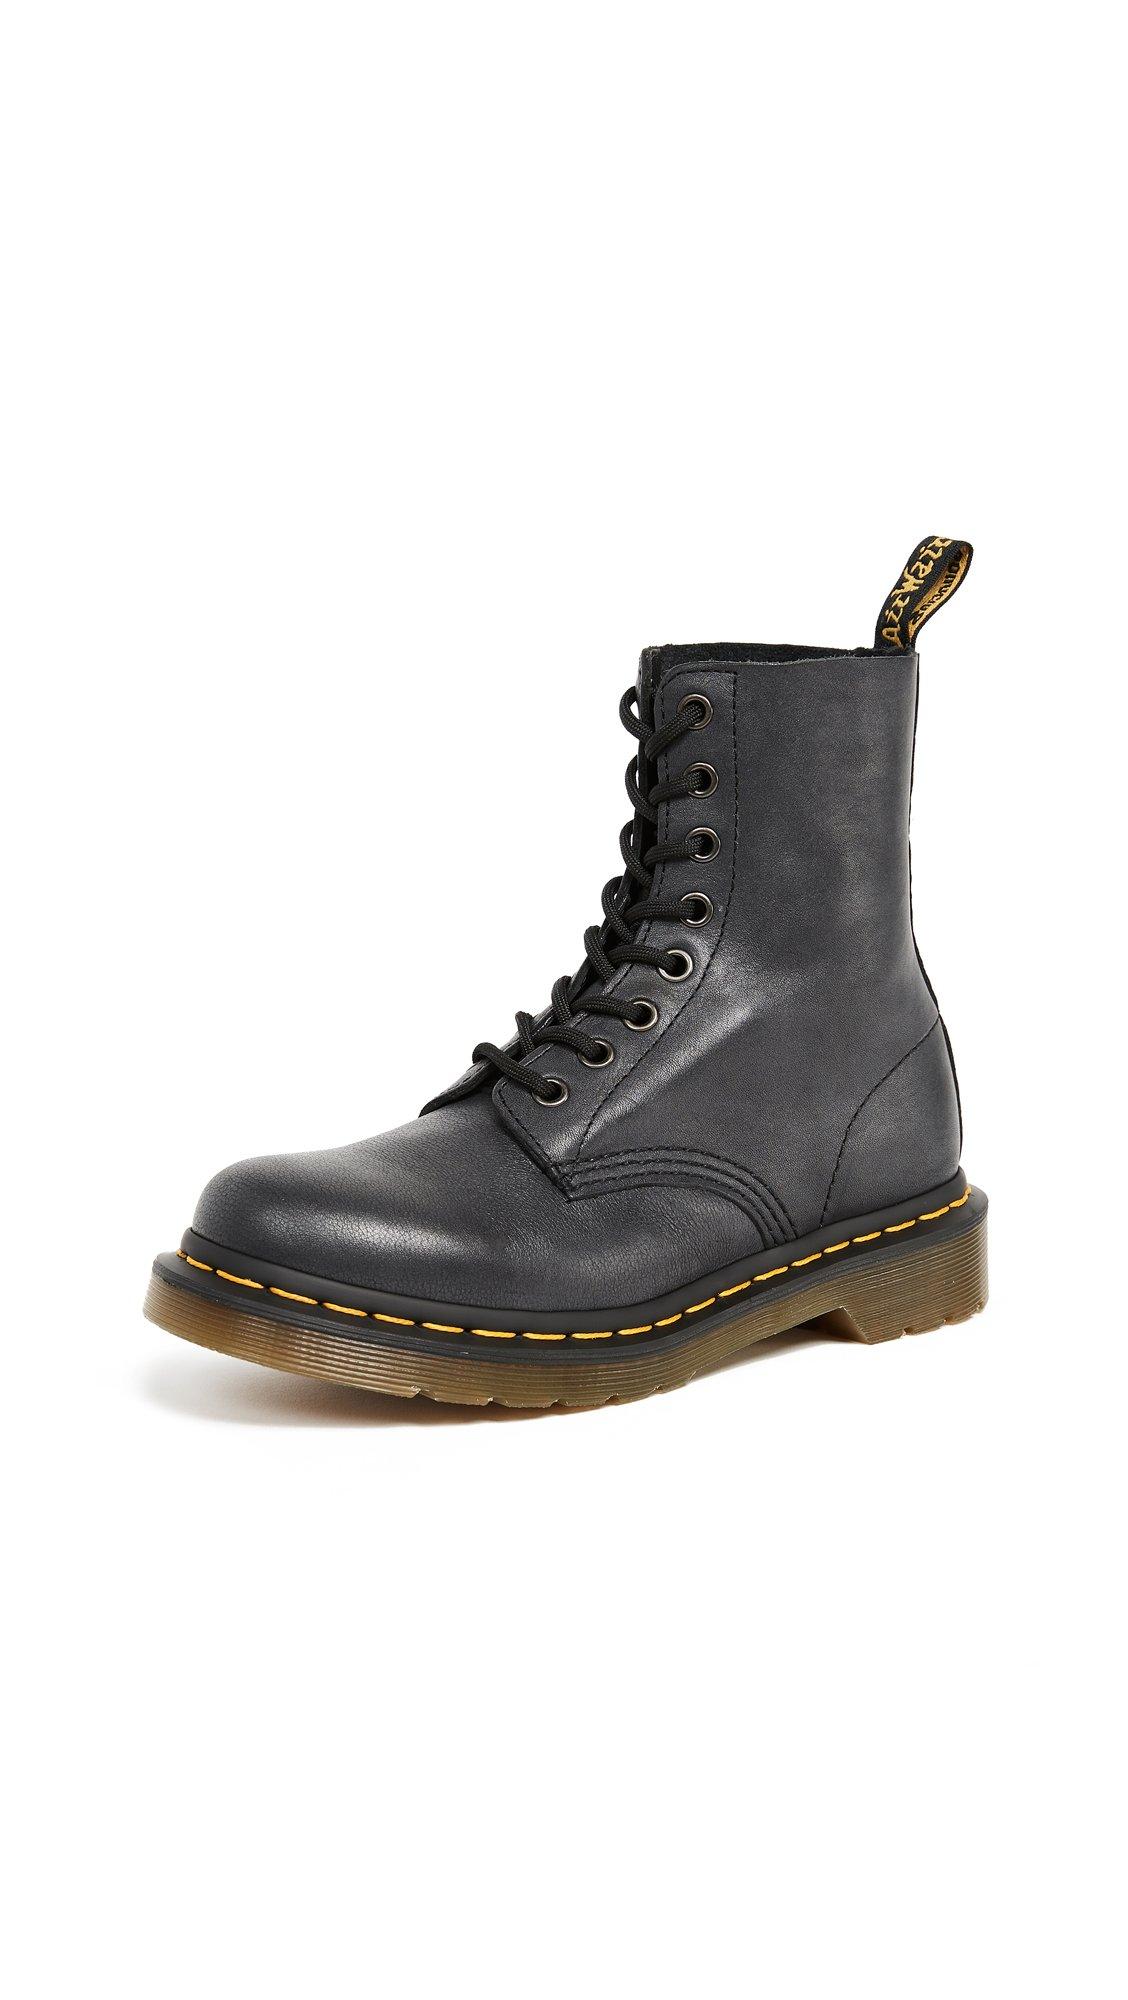 Dr. Martens Vintage 1460 Boot,Black,UK 8 (US Women's 10 M, US Men's 9 M)